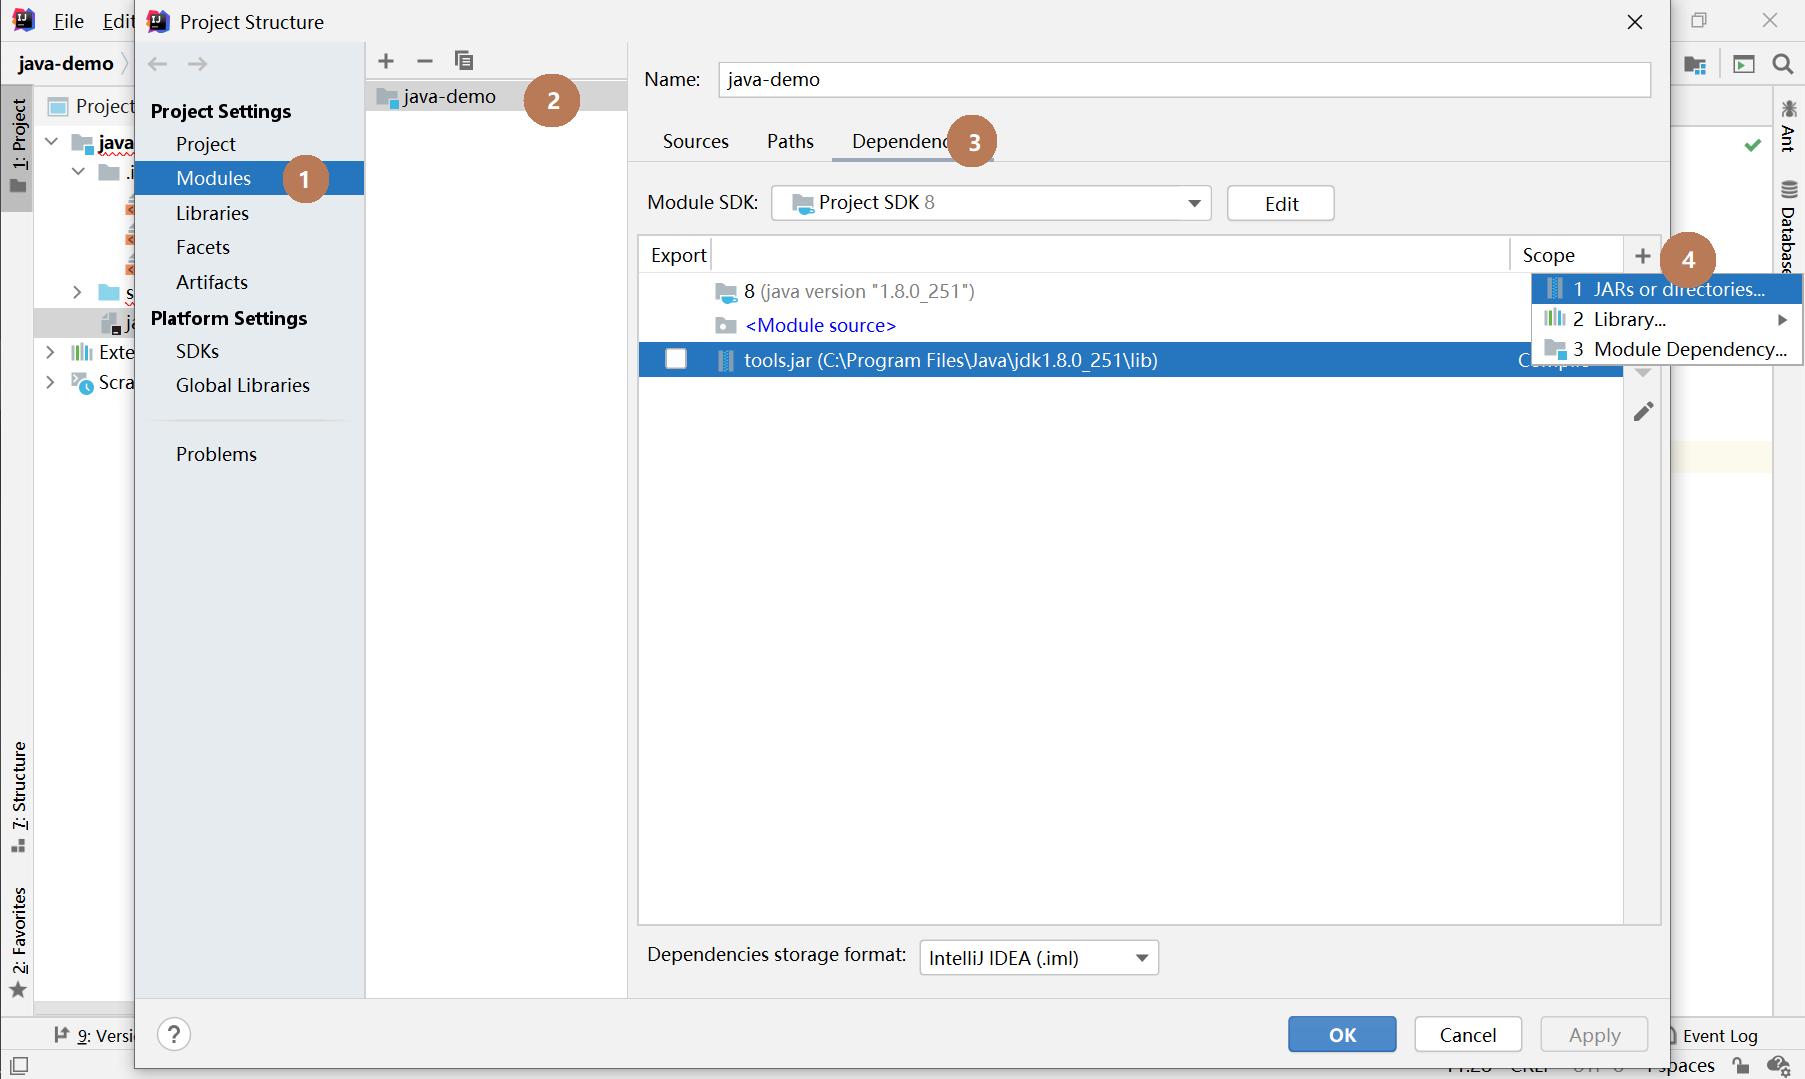 「解决方案」JDK11环境下的Android/Java项目中导入tools.jar包依赖